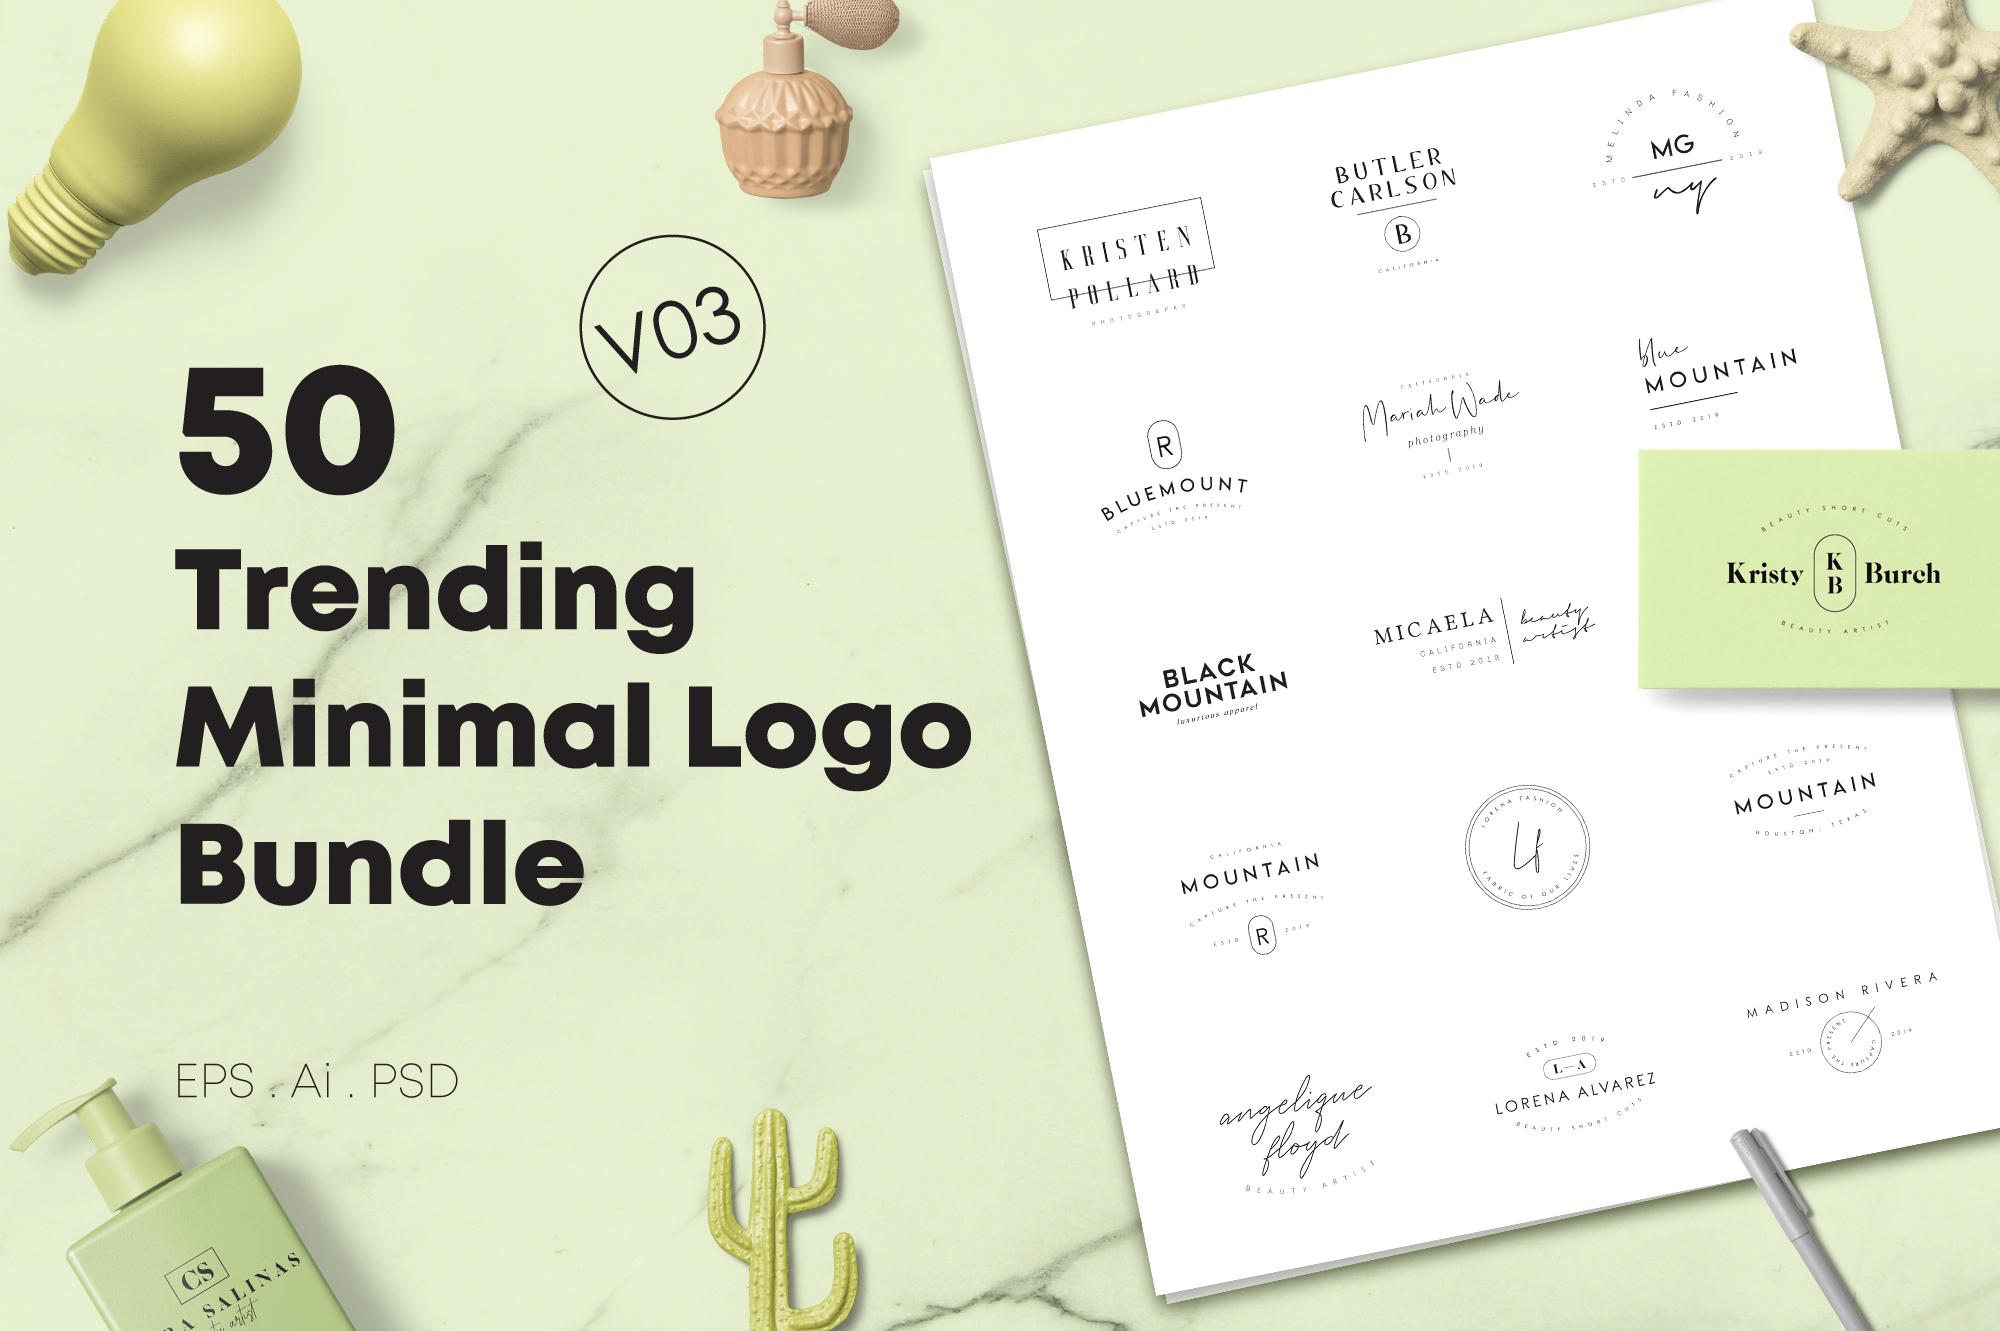 200 Trending Minimal Logo Bundle example image 16